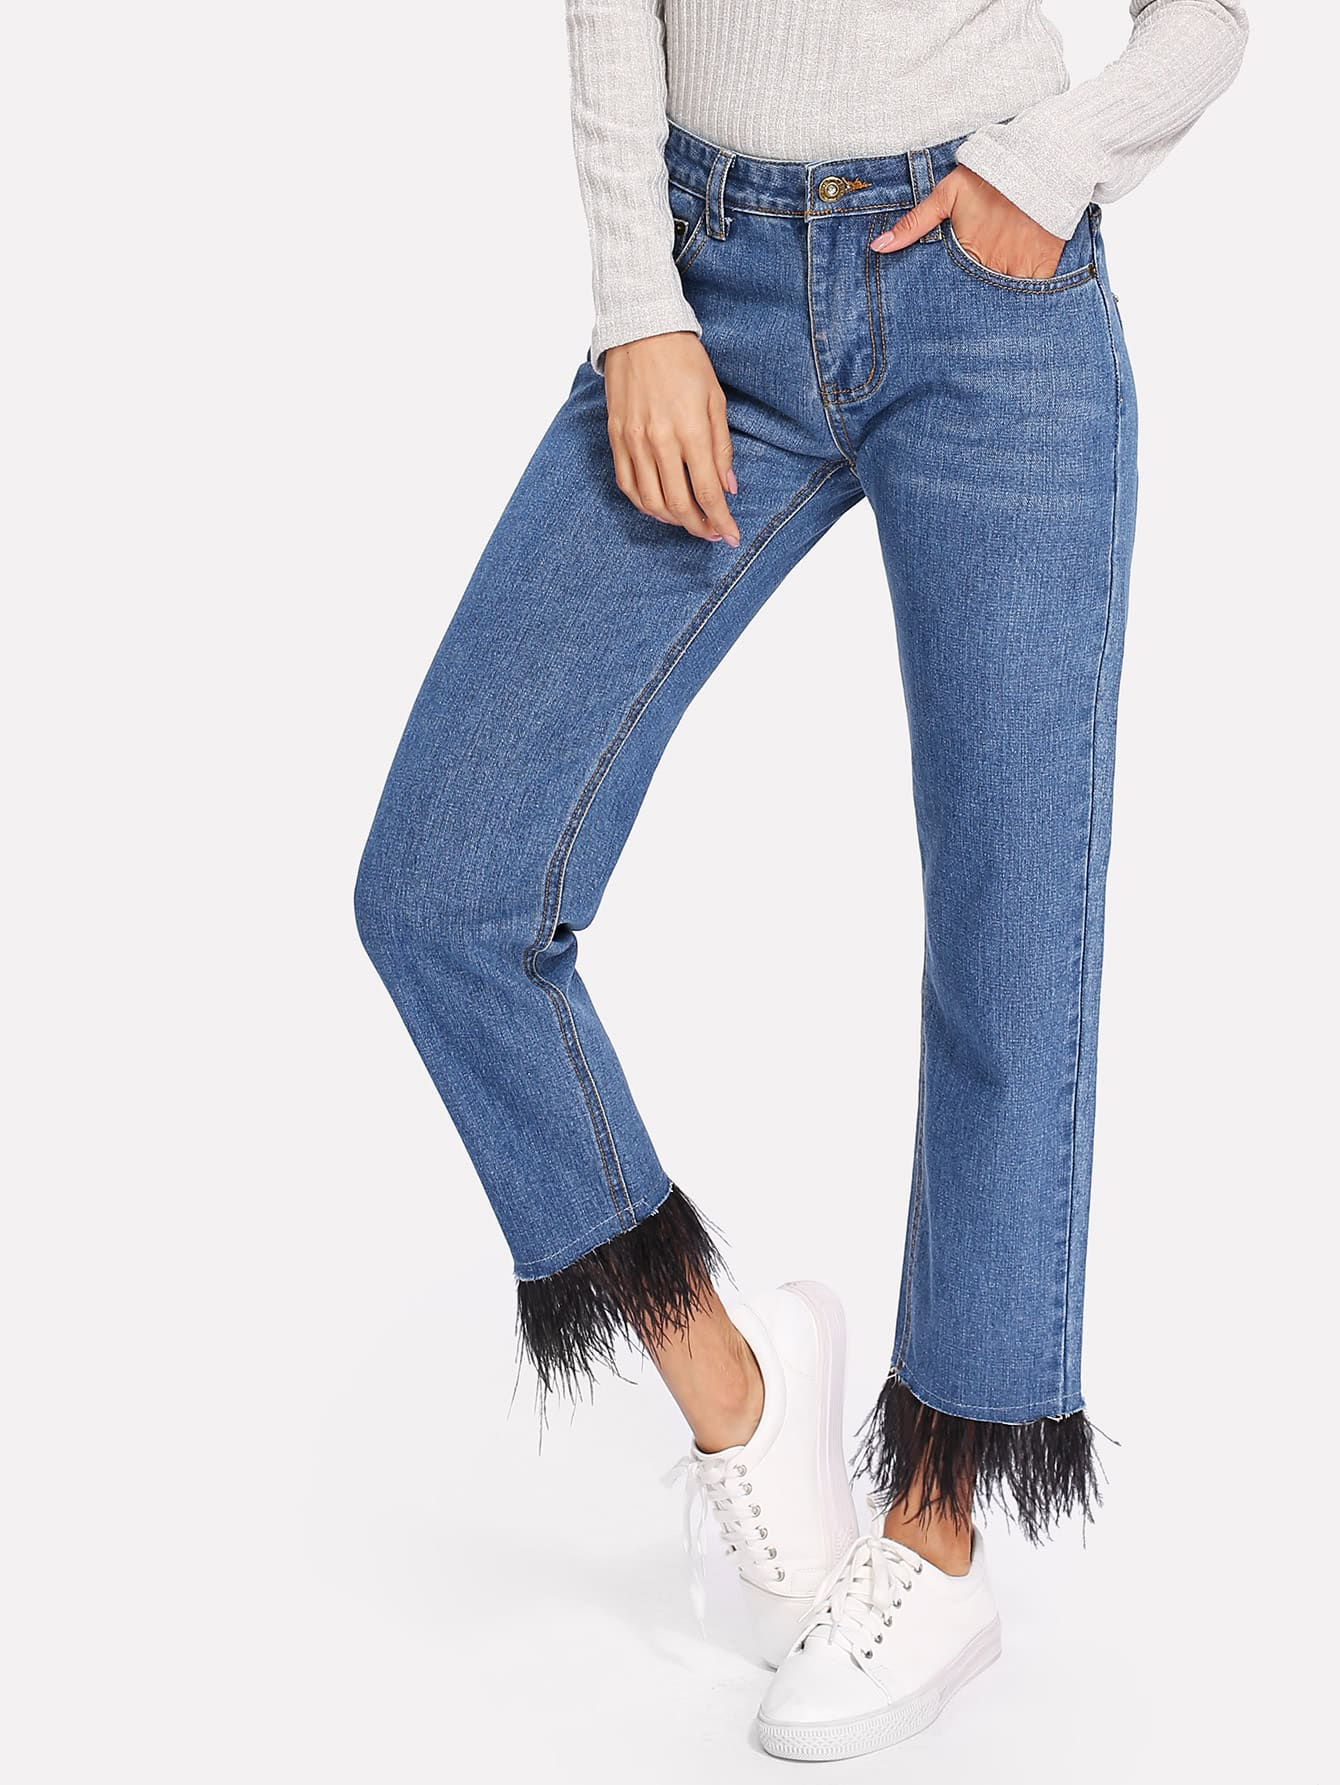 Feather Contrast Hem Jeans